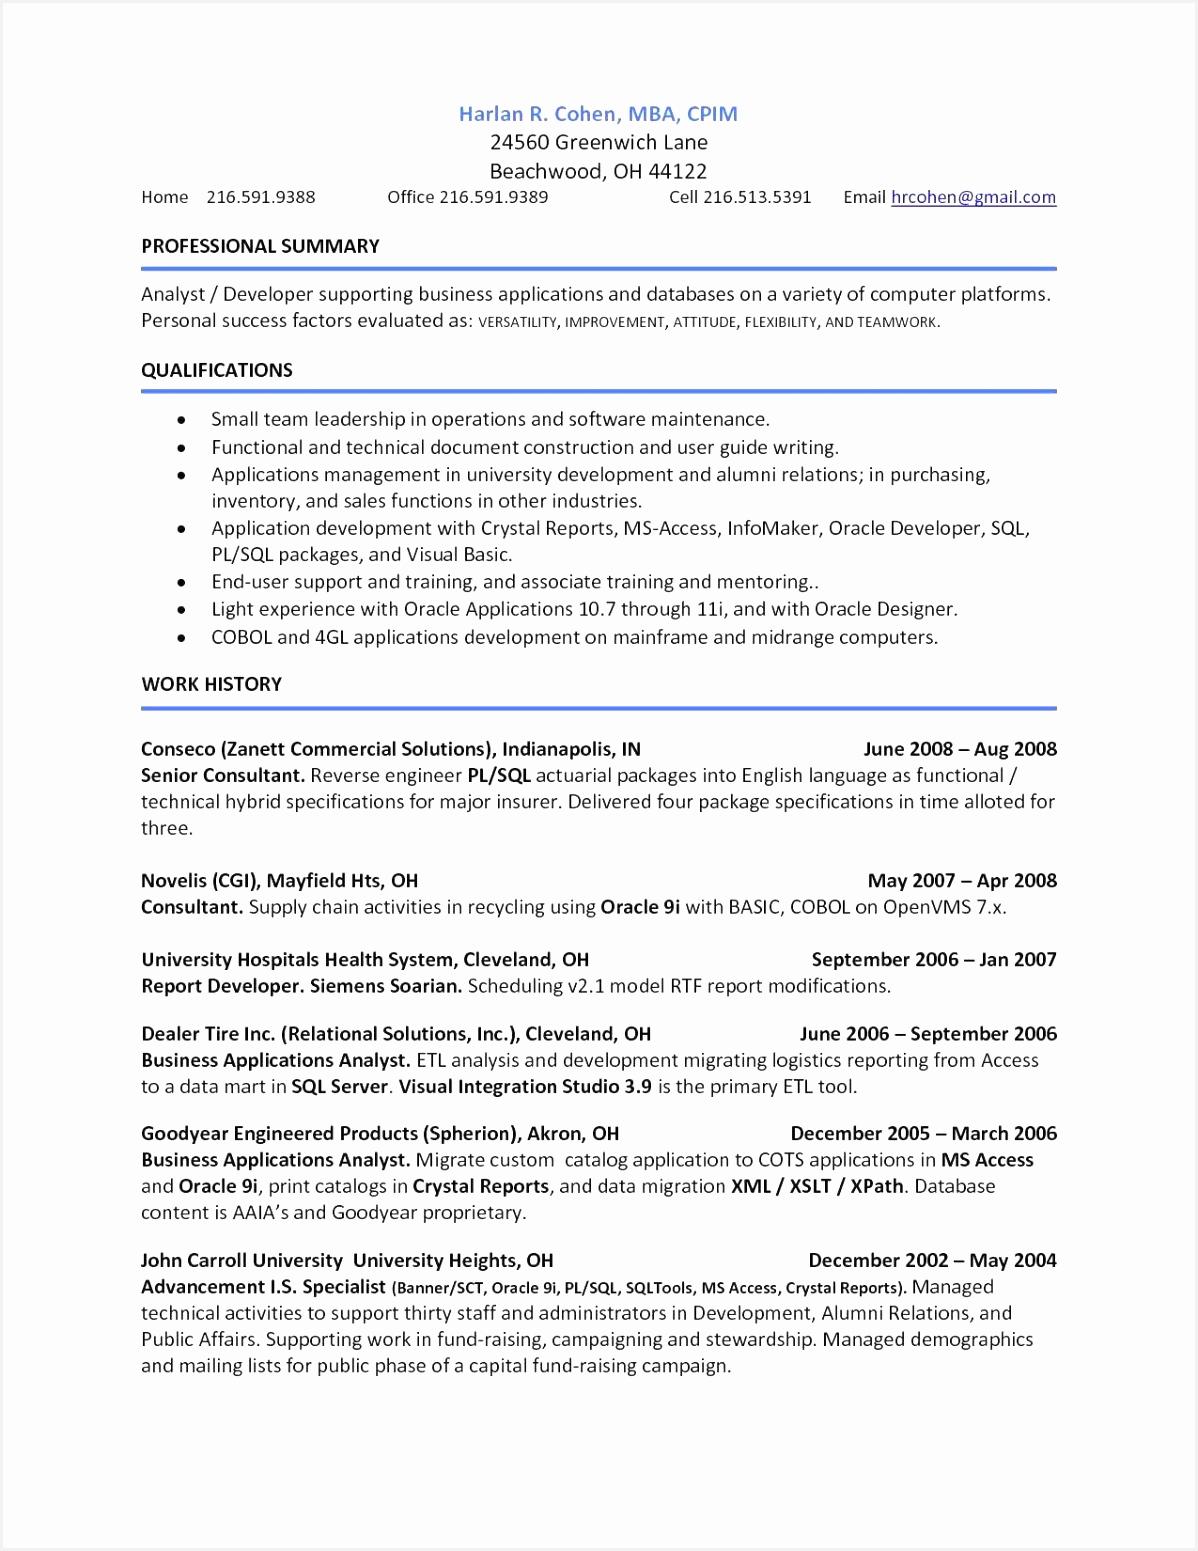 Functional Resume Sample Accounting Clerk Valid Dealer Resume Unique List Resume Skills New Resume Examples 0d 15511198fuknr